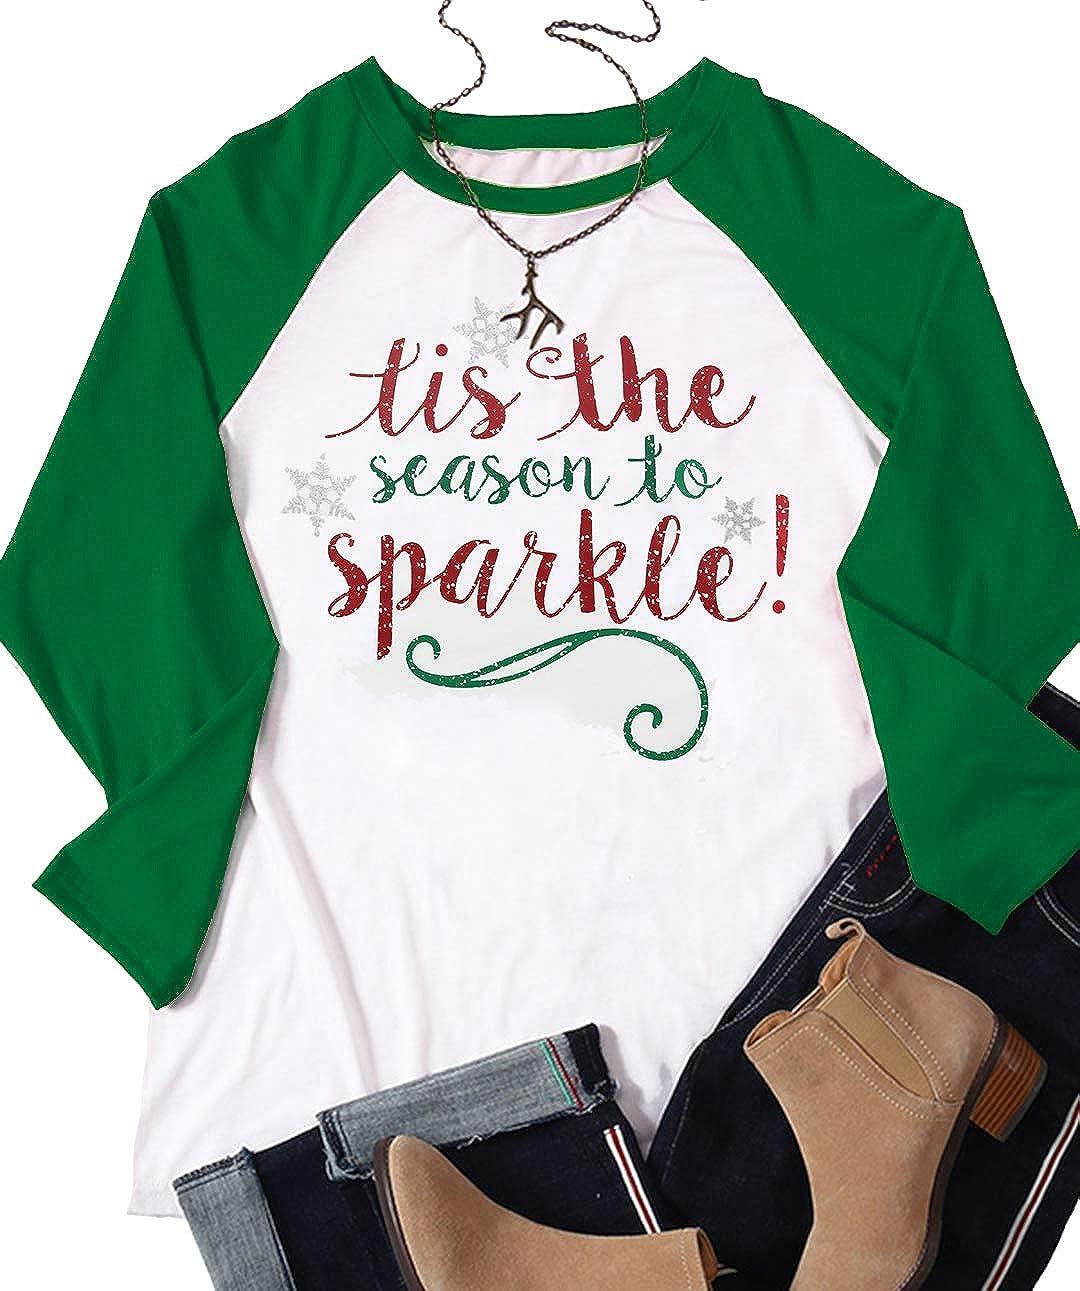 fdbd54d740db Amazon.com: Women Tis The Season to Sparkle Christmas Raglan Sleeve T Shirt  Funny Snowflake Print 3/4 Sleeve Splicing Tops Tees Size 2XL (Green):  Clothing